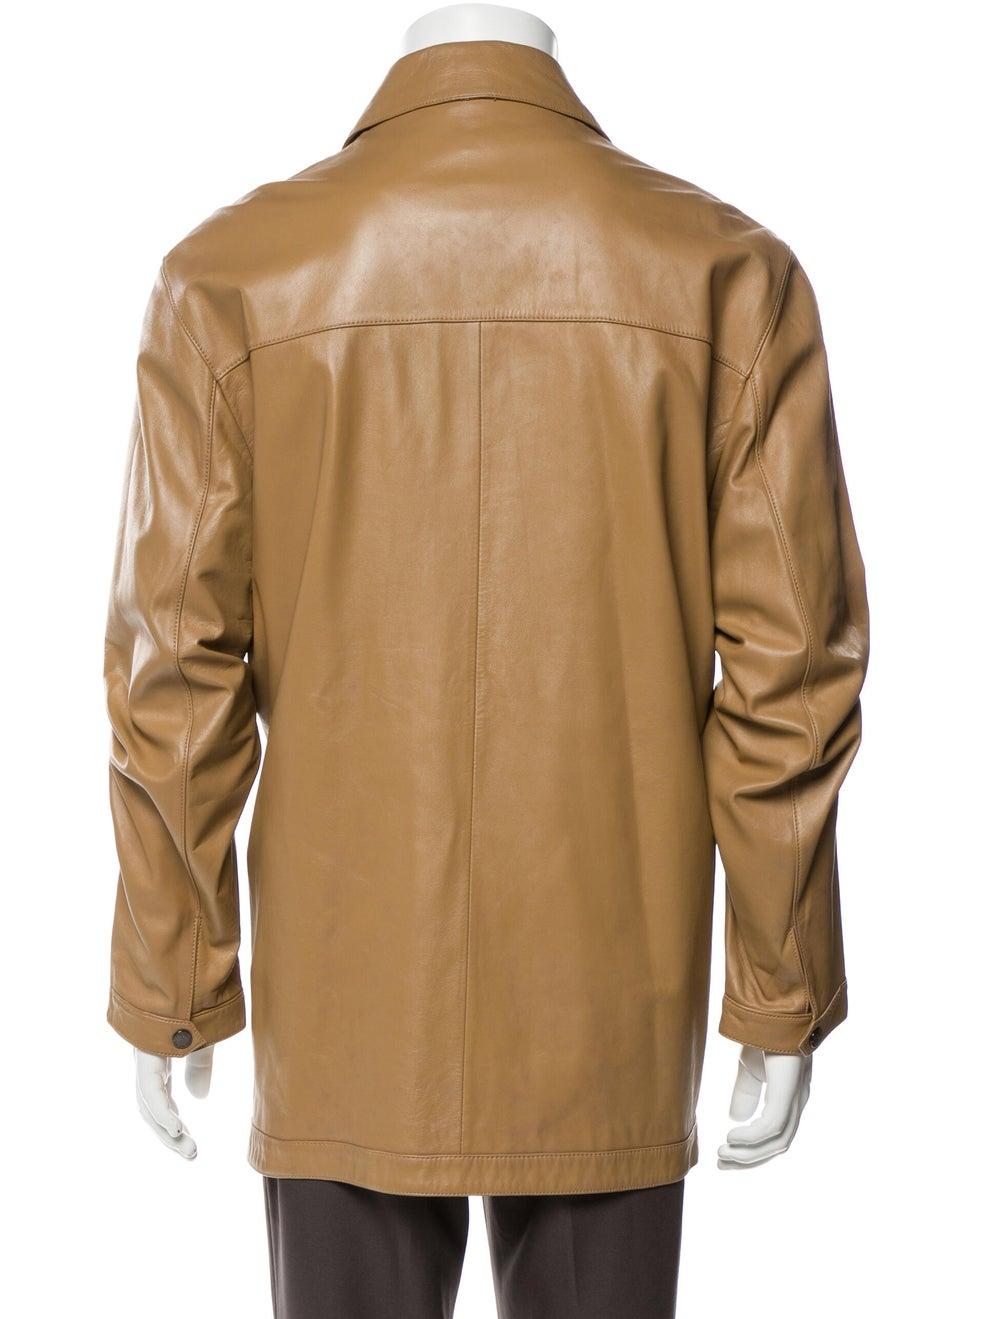 Balenciaga Lamb Leather Jacket - image 3